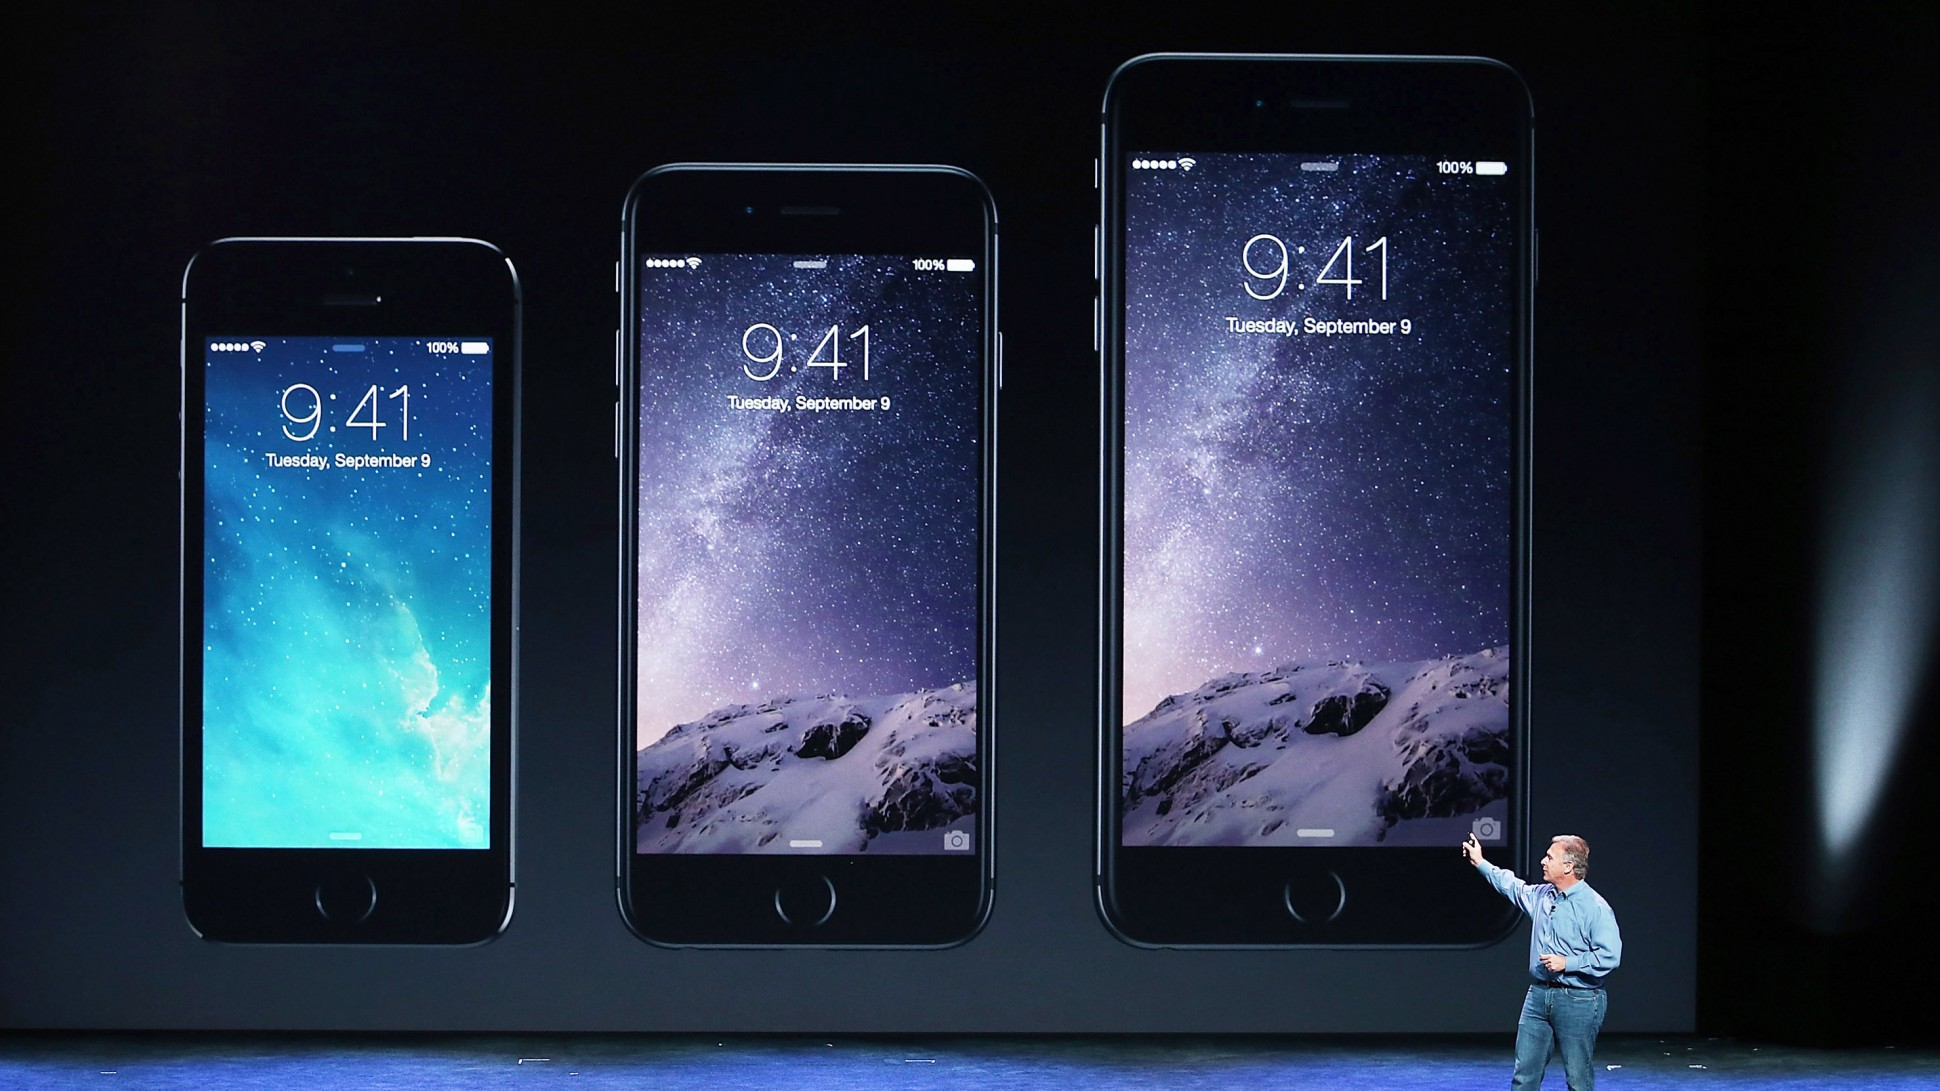 Data uscita smartphone iphone 6s for Smartphone in uscita 2015